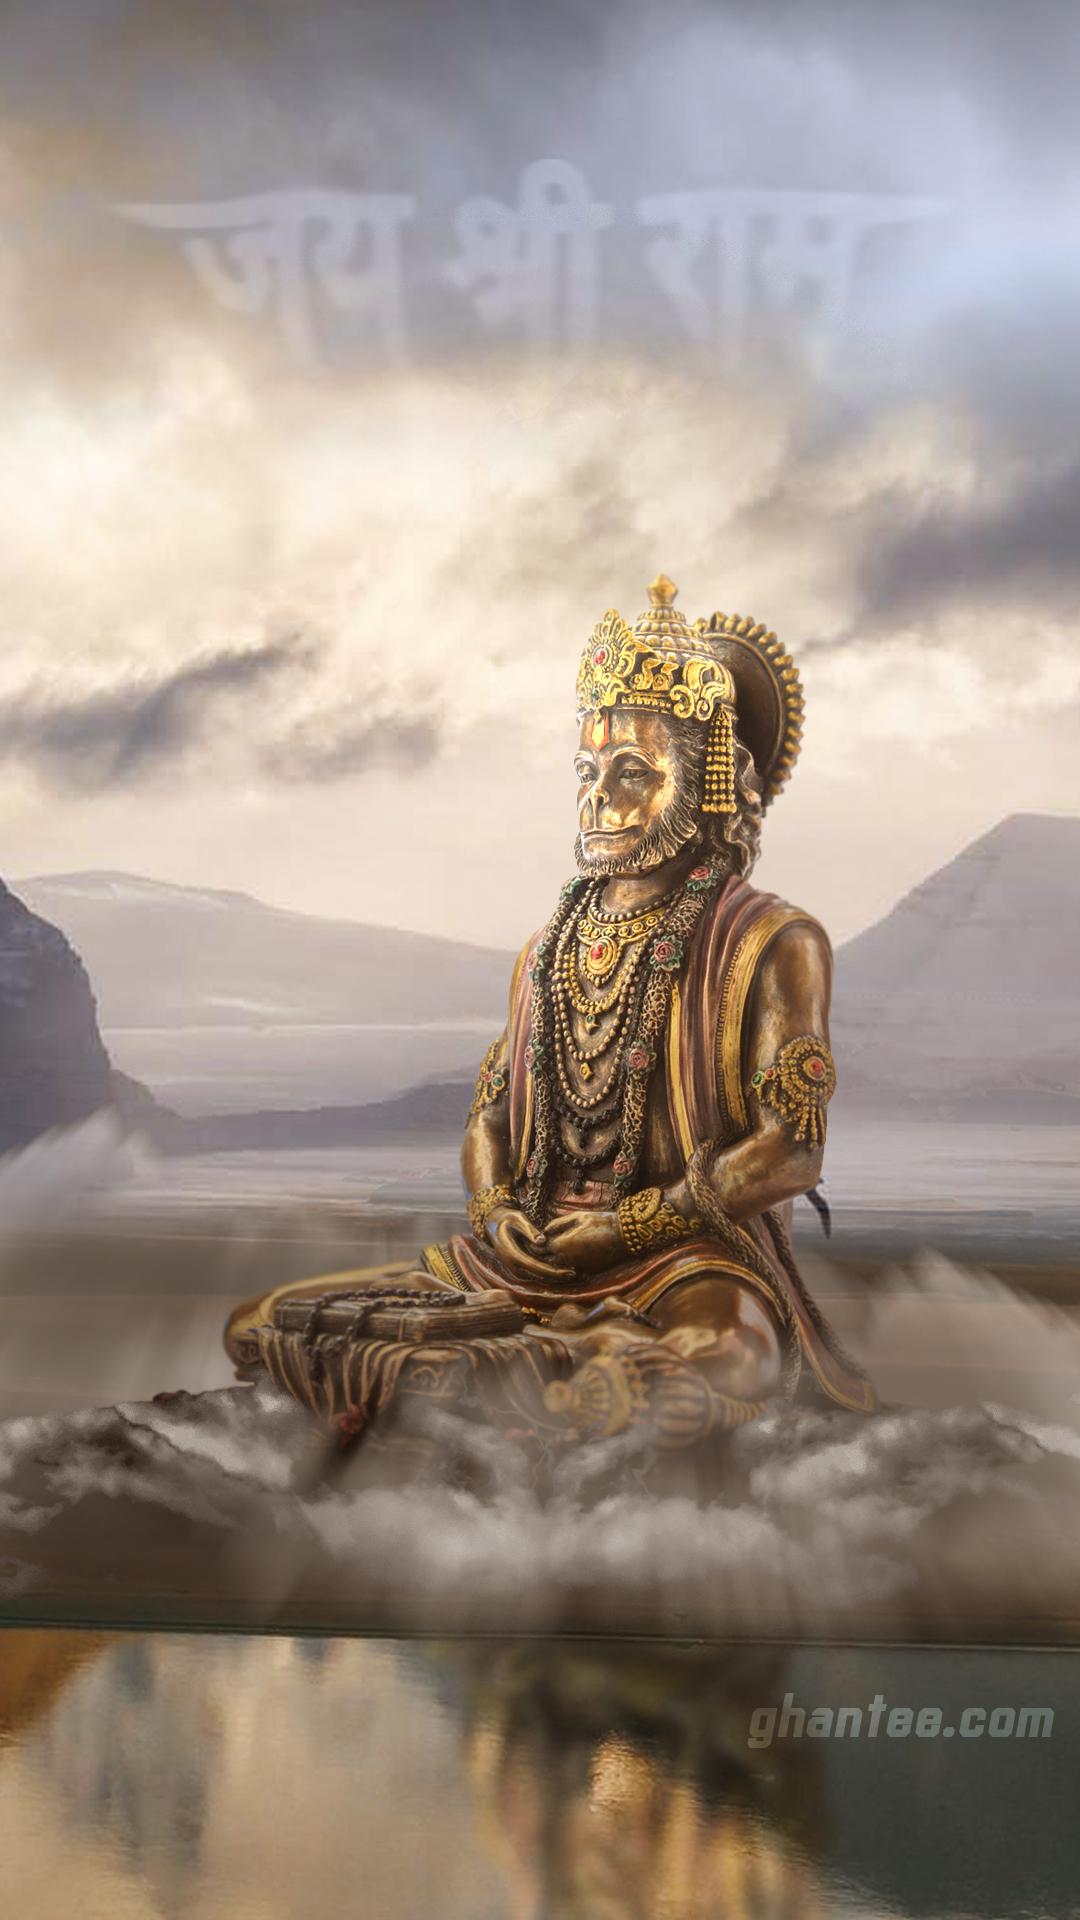 hanuman hd wallpaper for iphone – Jai shri ram